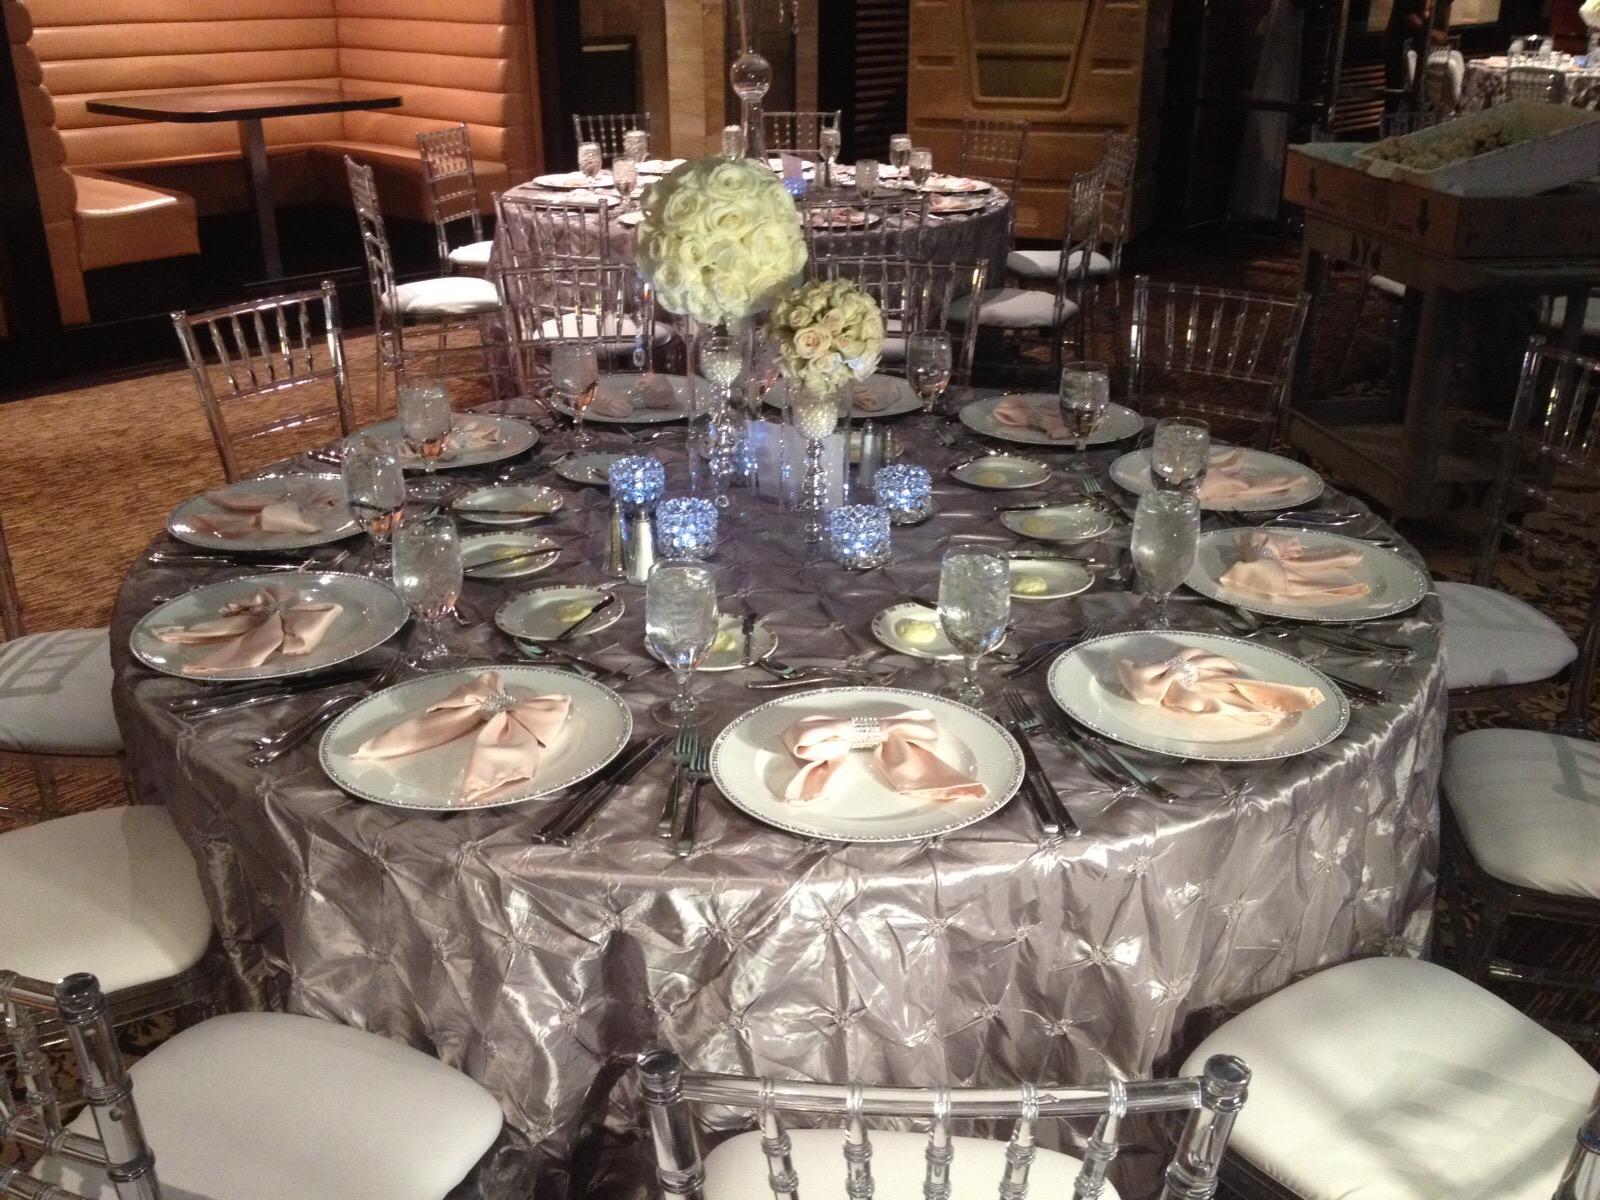 las vegas wedding videographers, memory lane video, m resort hotel